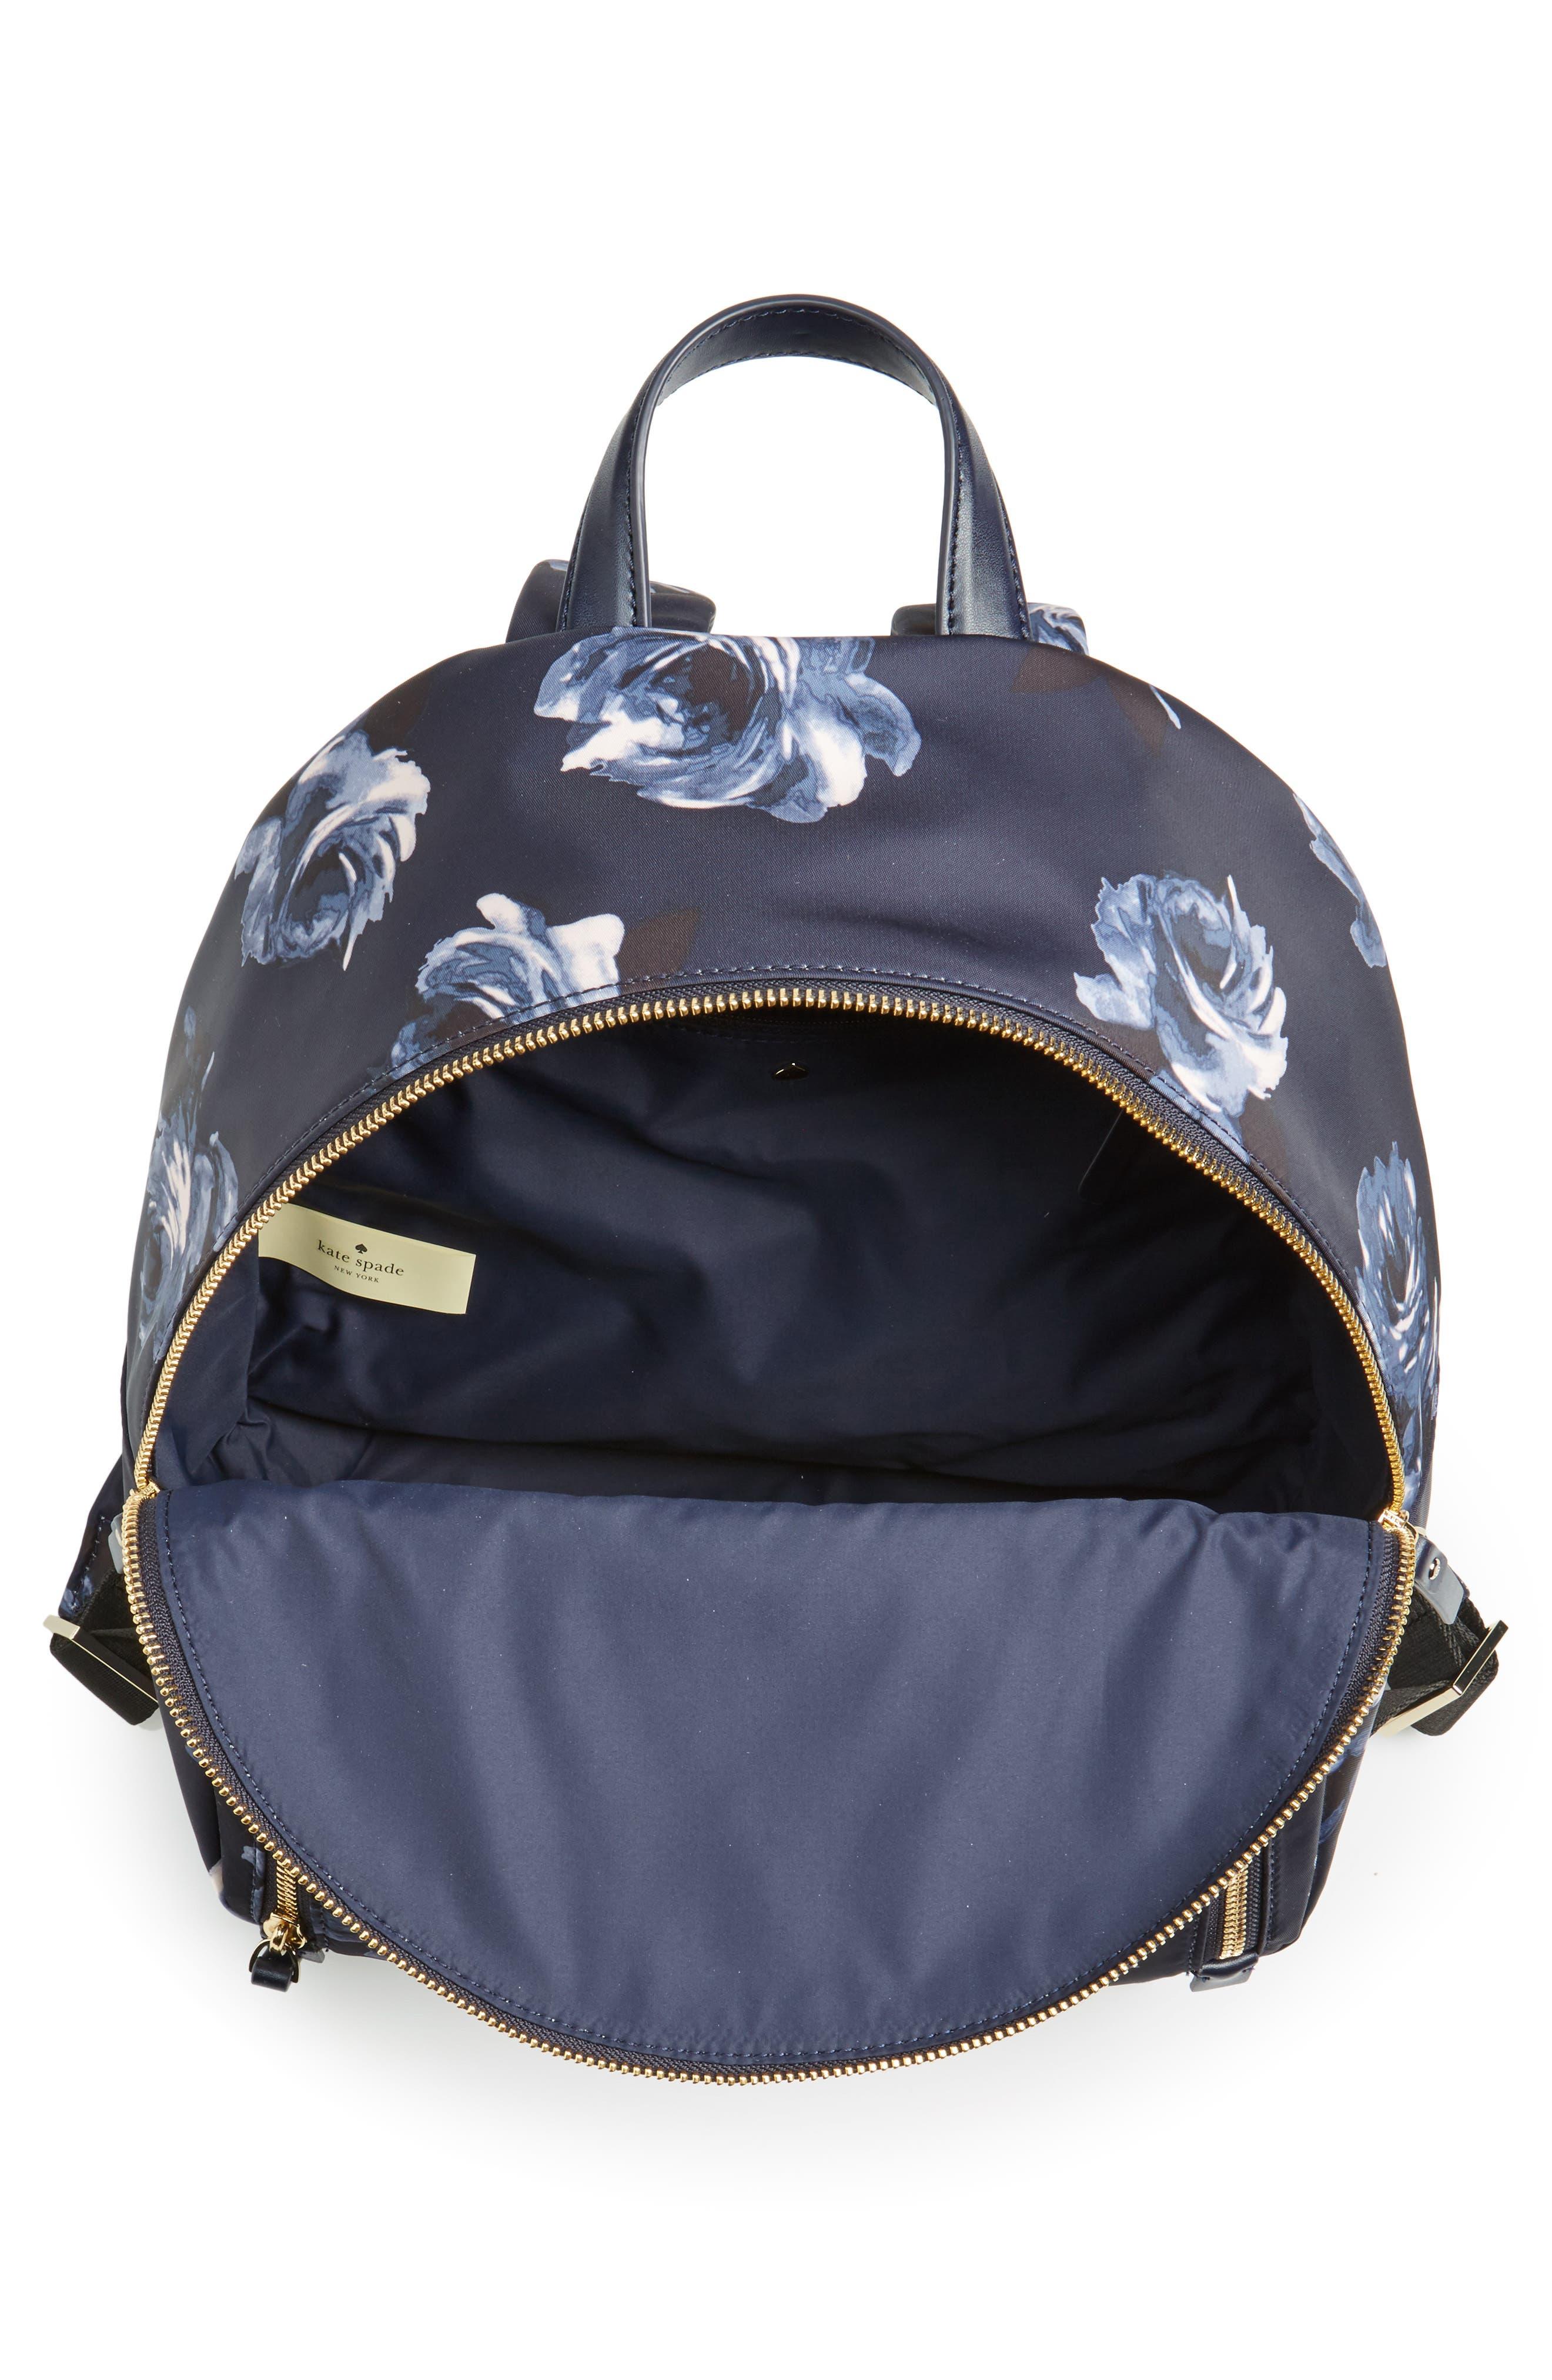 watson lane night rose hartley nylon backpack,                             Alternate thumbnail 4, color,                             Night Rose